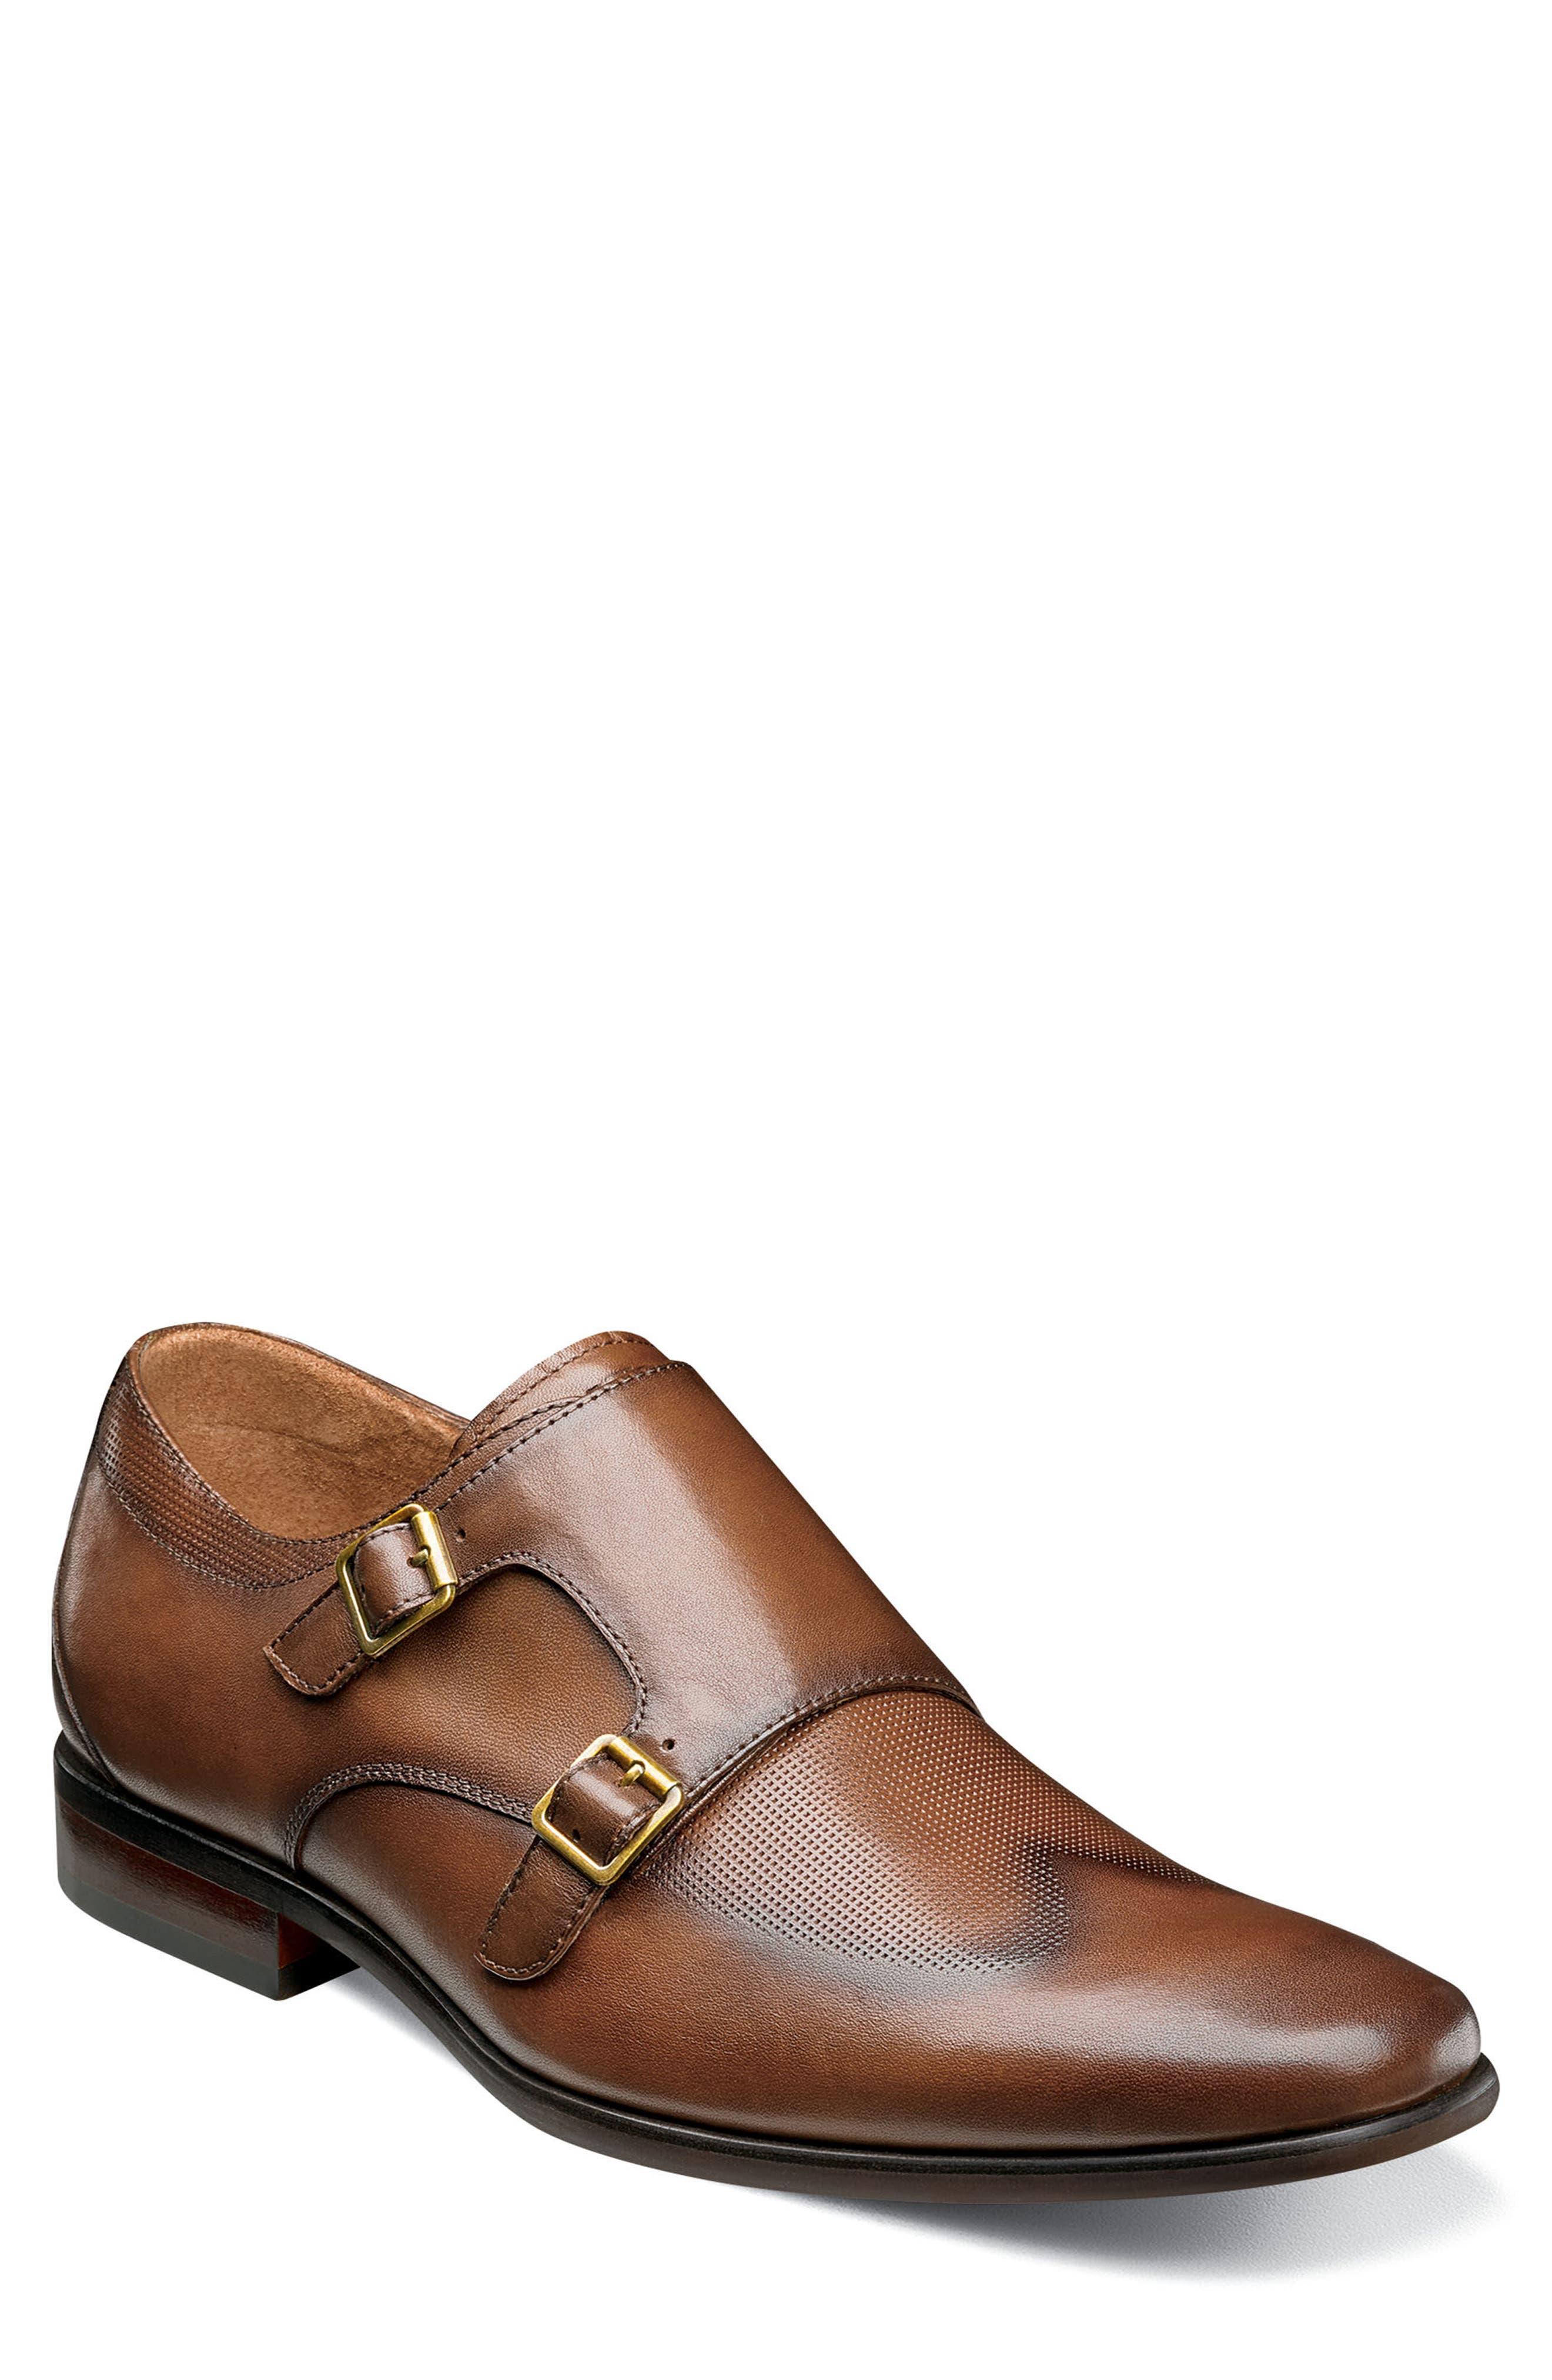 Florsheim Men's Postino Textured Double Strap Monk Shoe Gb4Kxoo